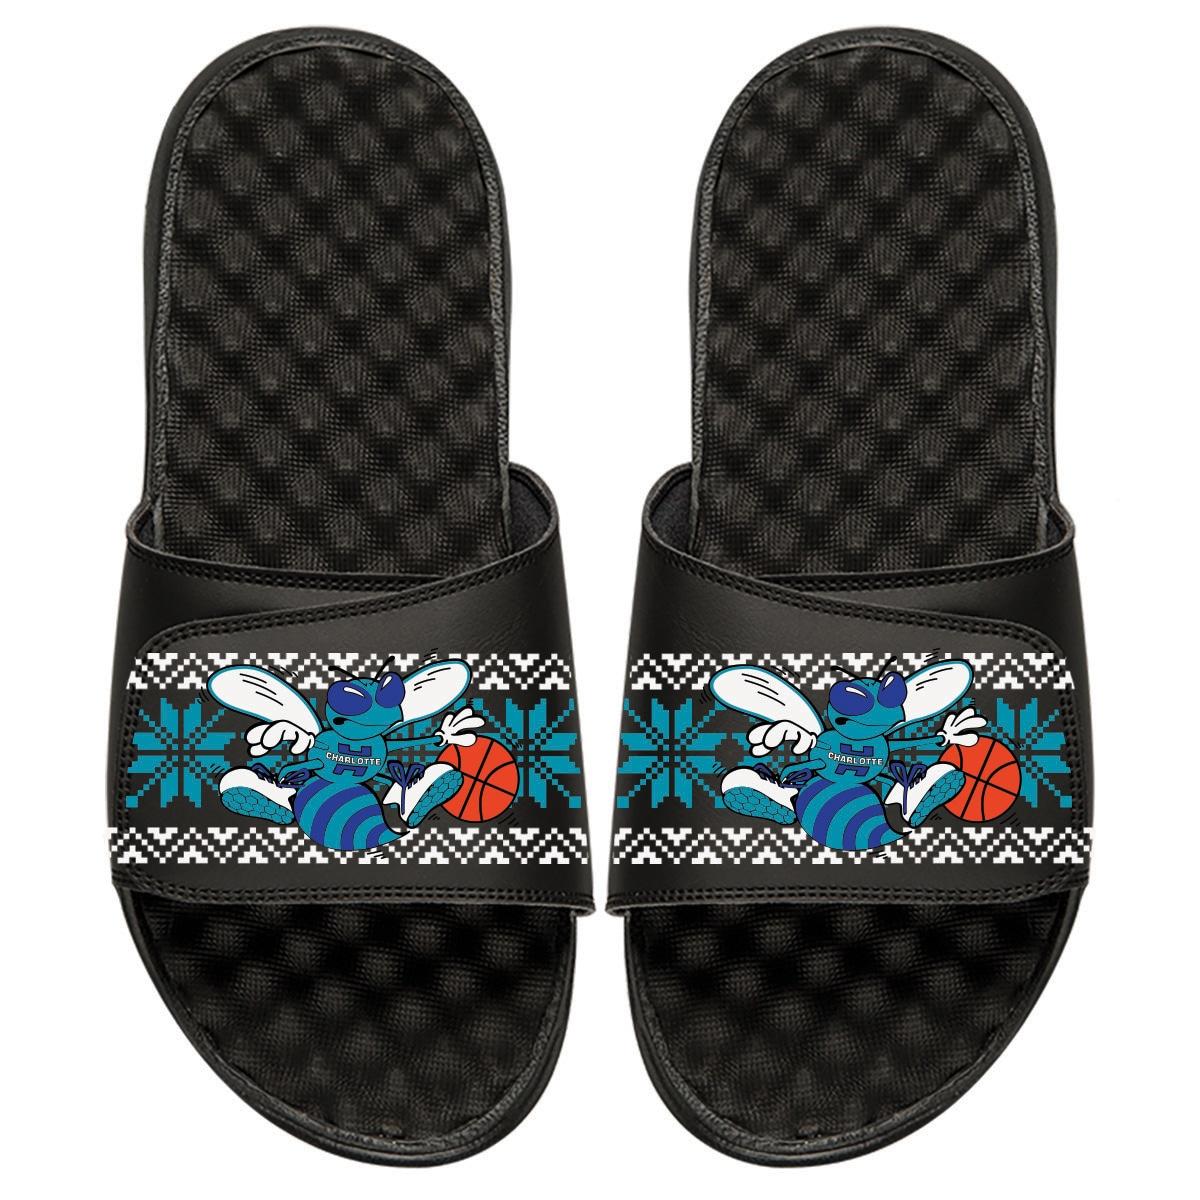 Charlotte Hornets ISlide Youth Ugly Sweater Slide Sandals - Black